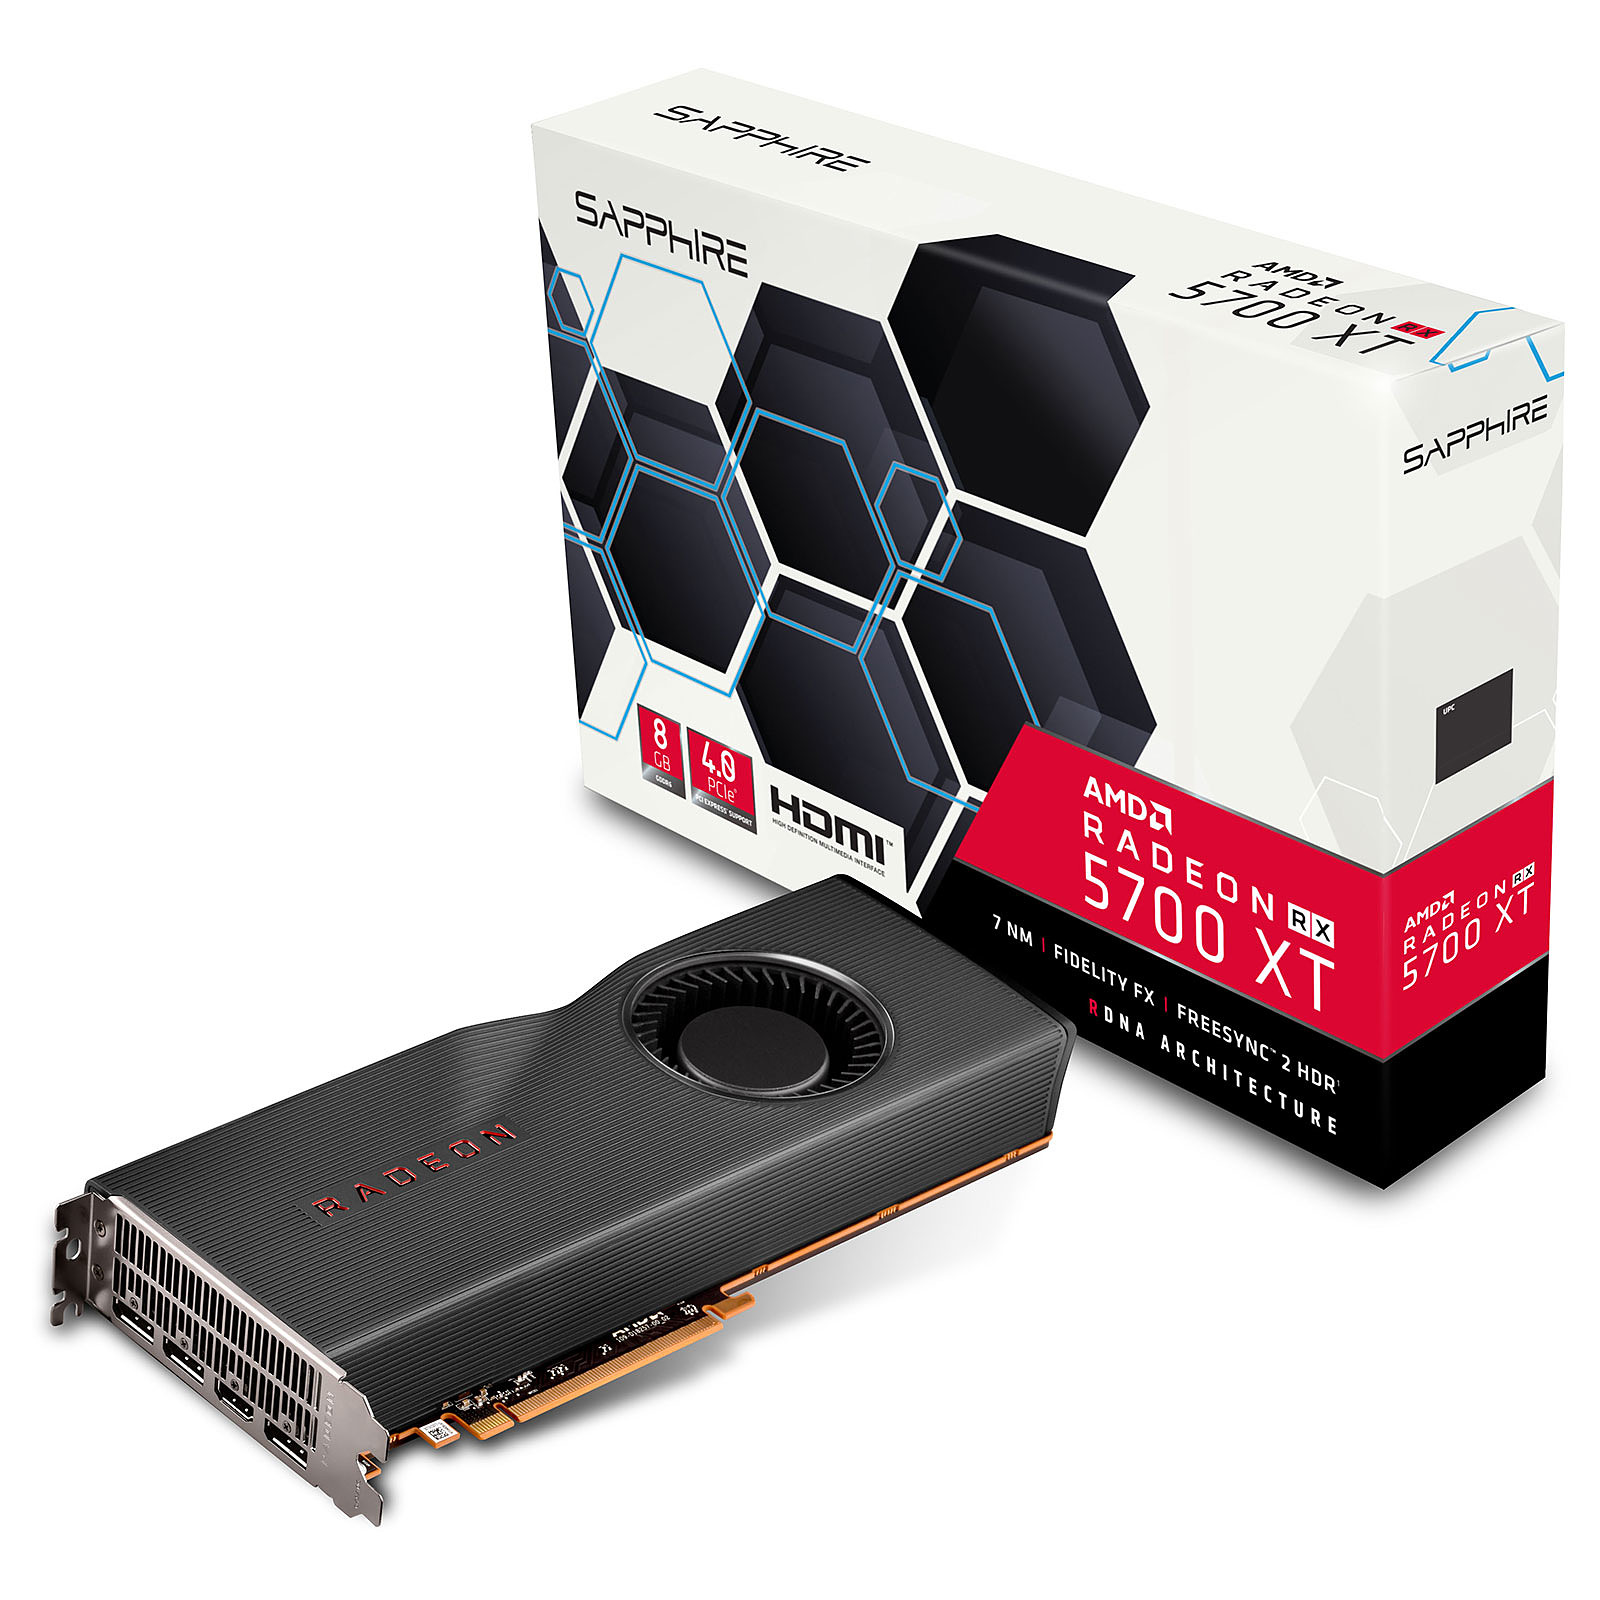 Sapphire Radeon RX 5700 XT 8G